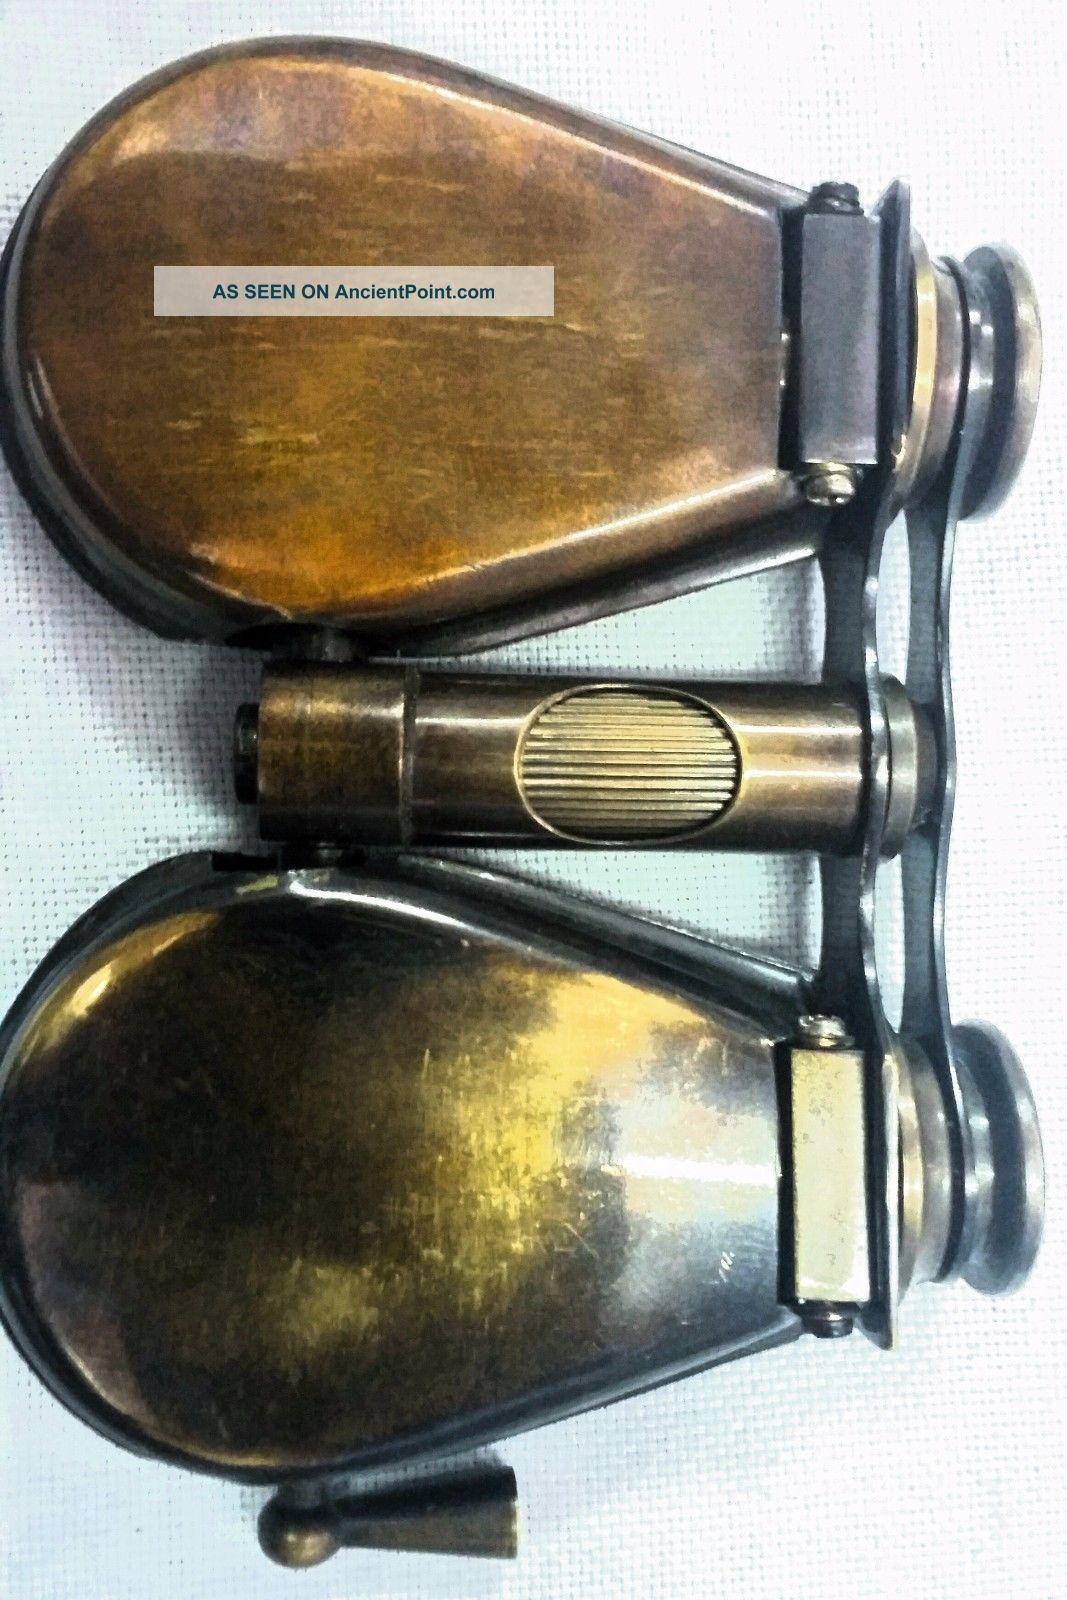 Kelvin And Hughes Binoculars Compasses photo